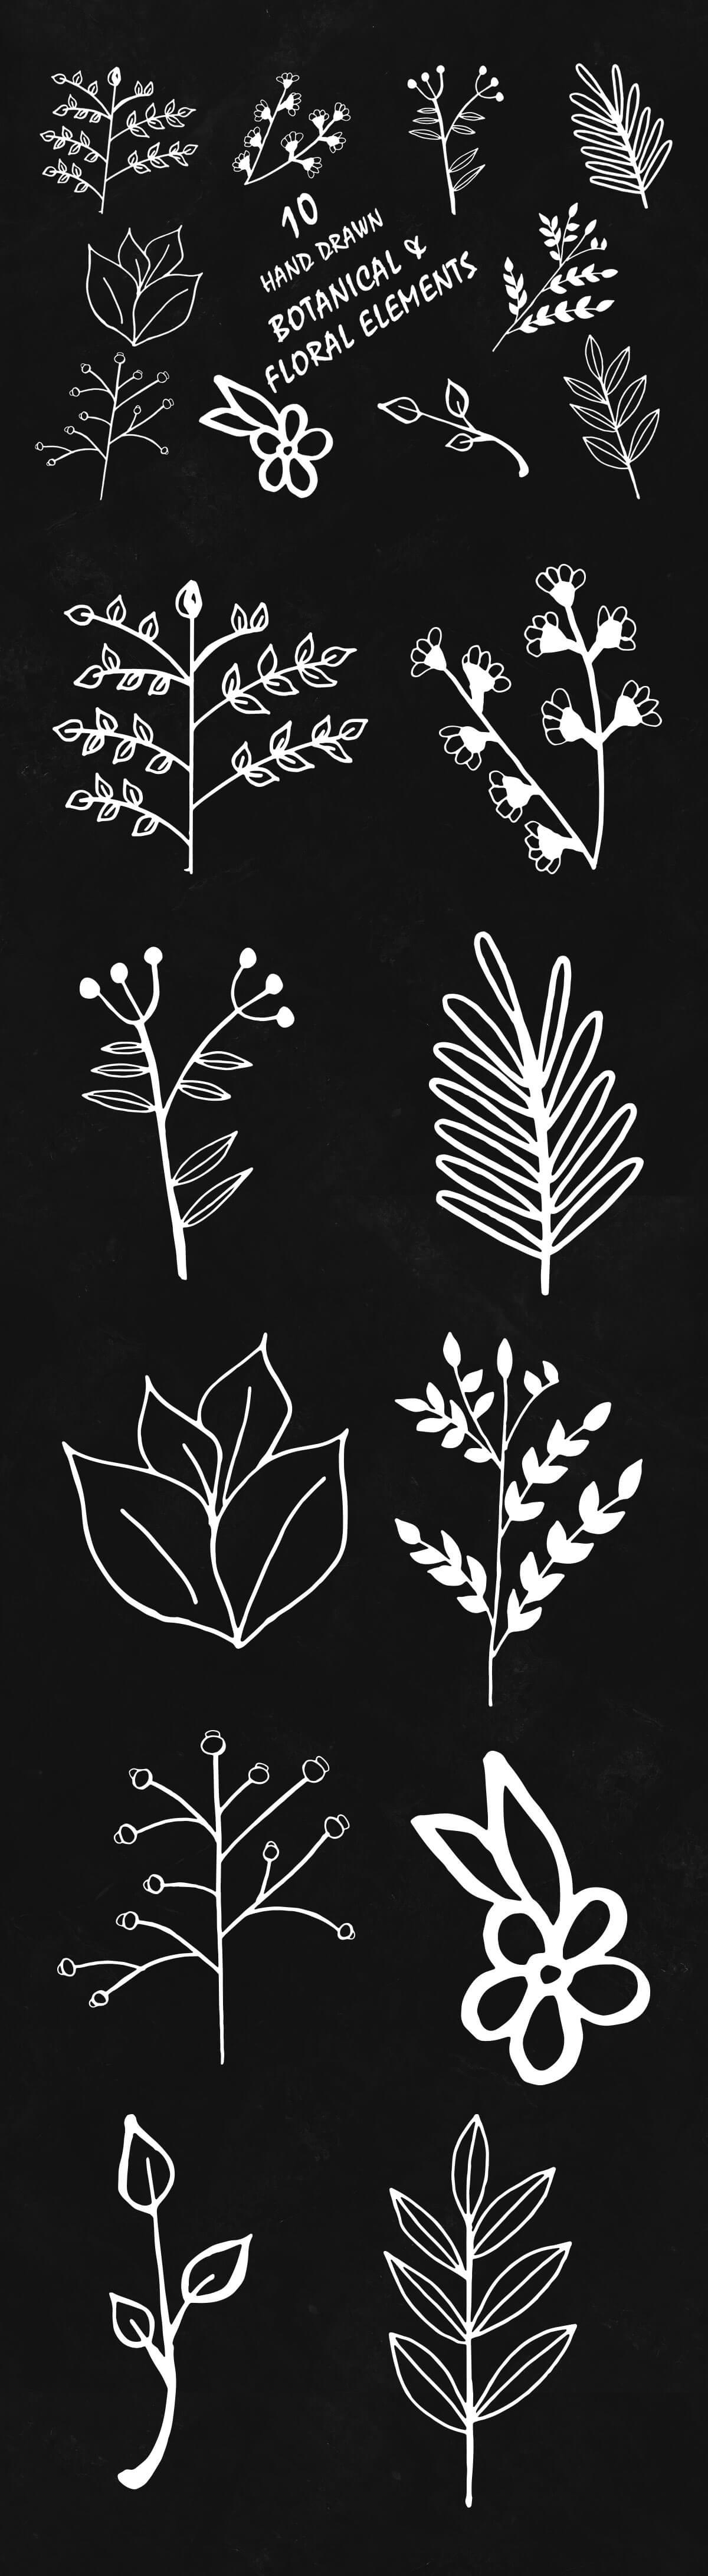 Free Handmade Botanical & Floral Elements